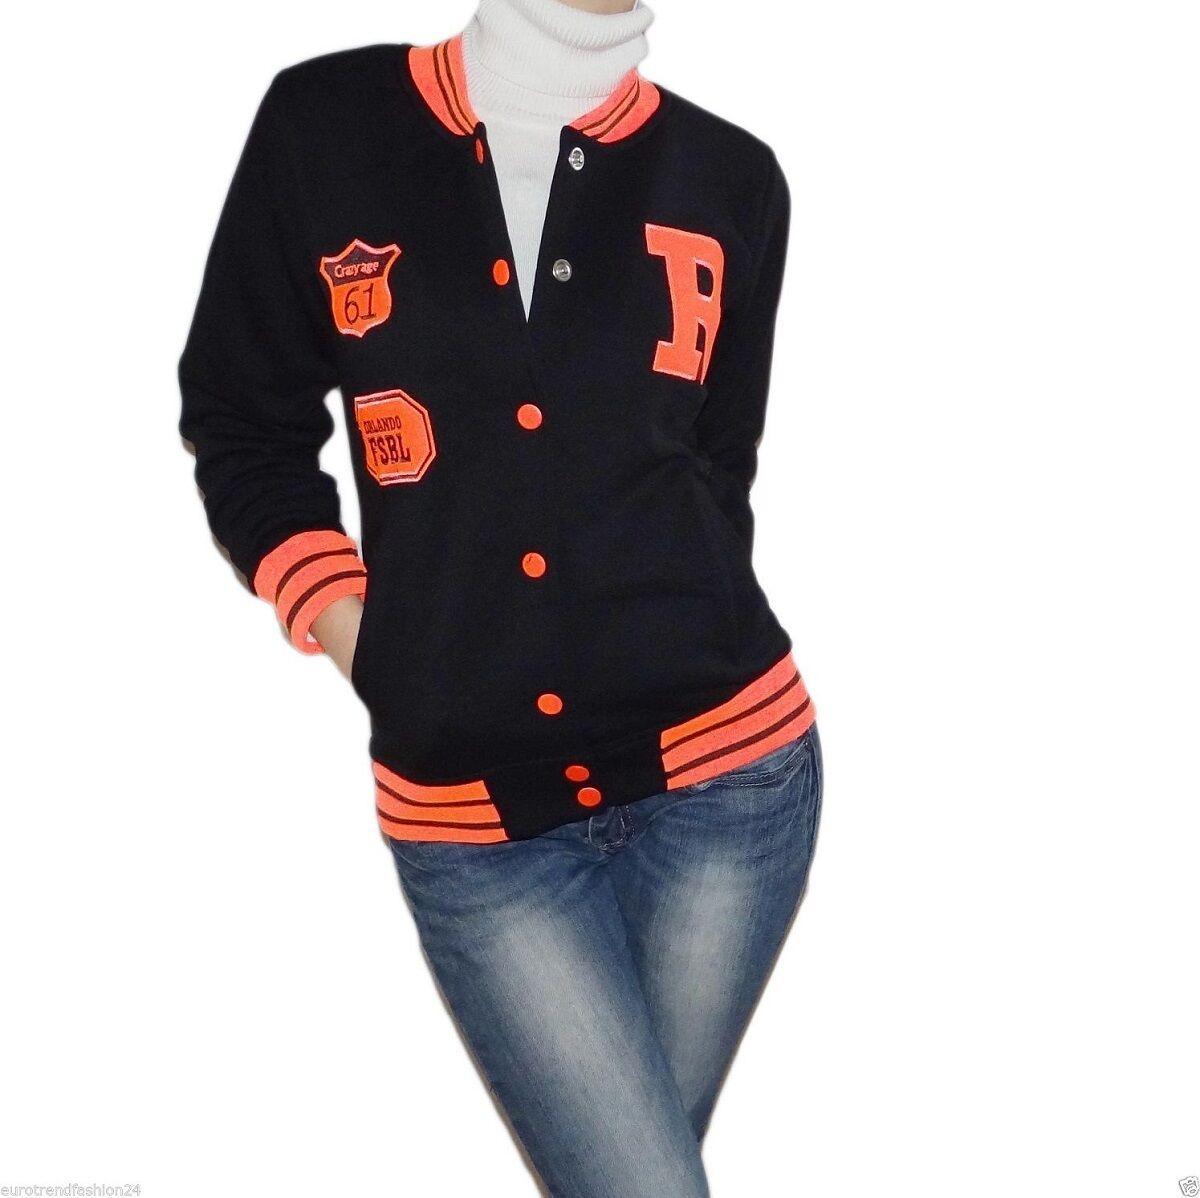 Damen Sweatjacke Sweatshirt Sport College Sport Pullover Fitness Jogging 34-40